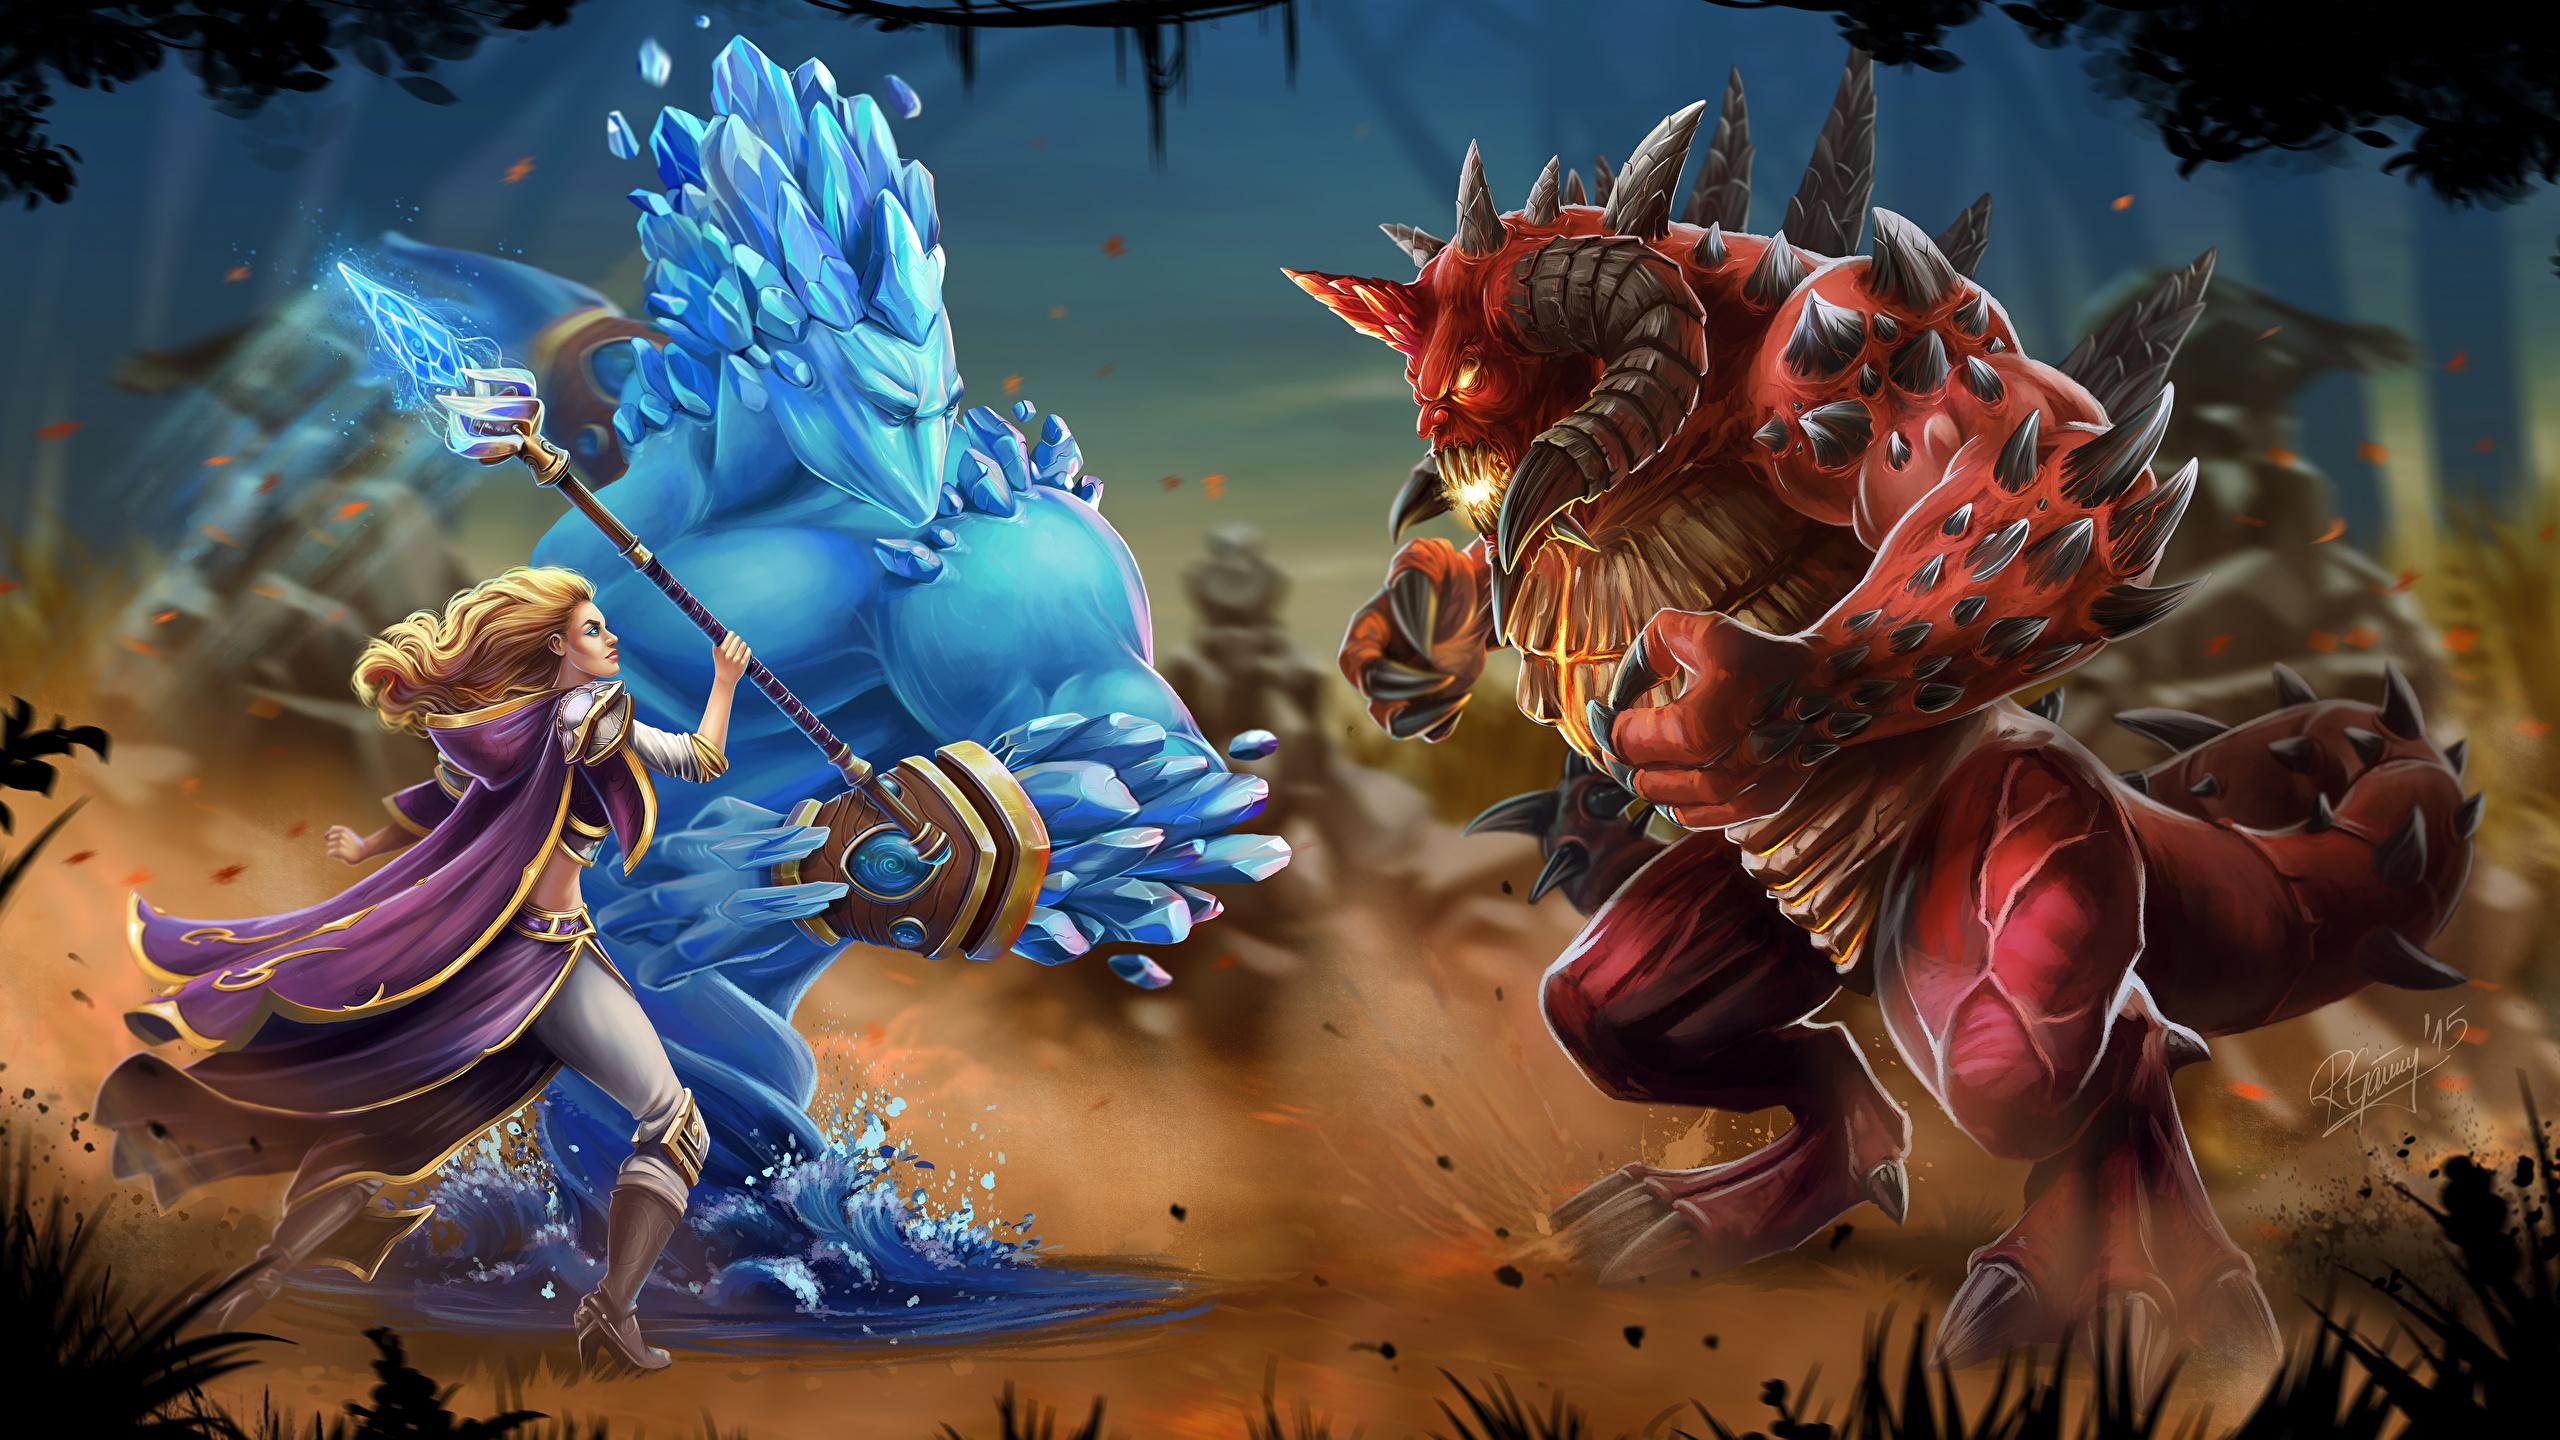 Fondos De Pantalla 2560x1440 Heroes Of The Storm Diablo